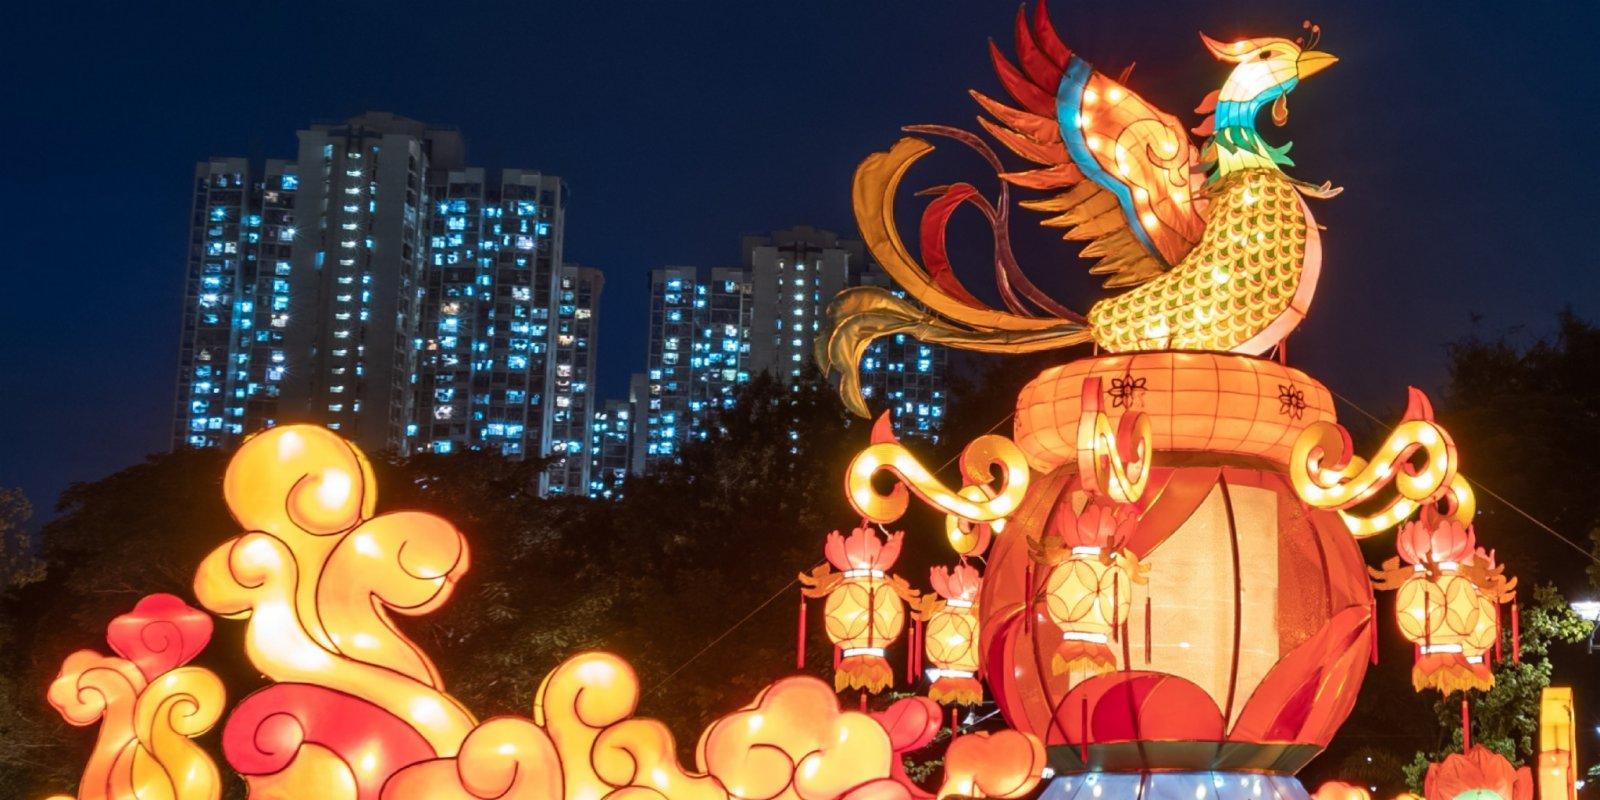 Photos | Lantern displays enliven HK parks to mark Mid-Autumn Festival